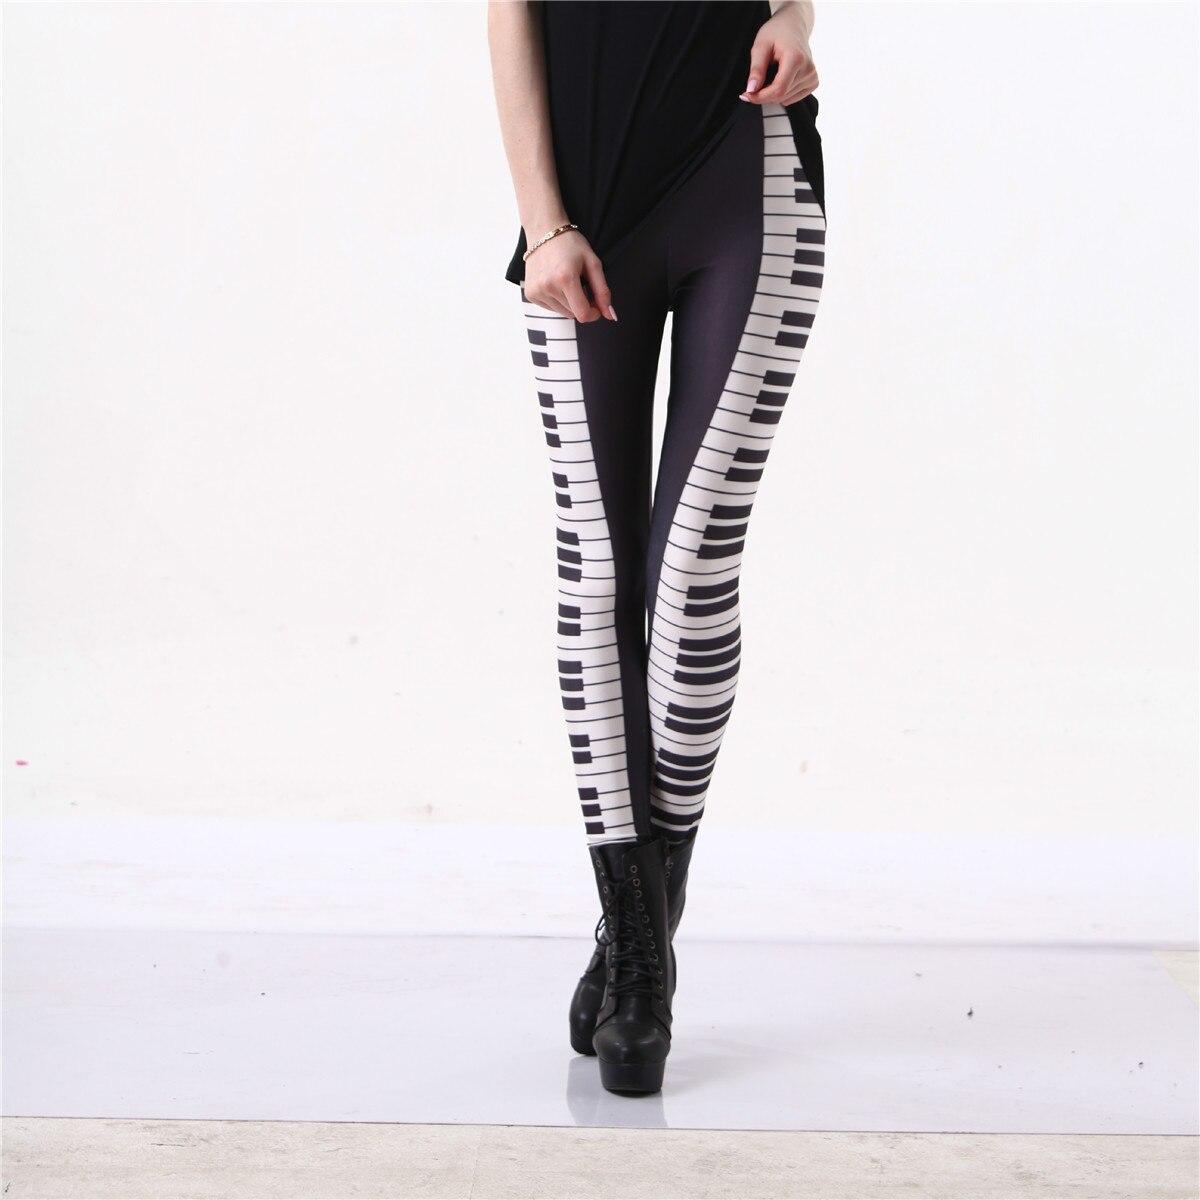 Piano Leggings Black White Stripe Sexy Leg Hot 3D Graphic Printed Music Keys Fitness Leggings Pants Gymwear Funky Capris S-4XL